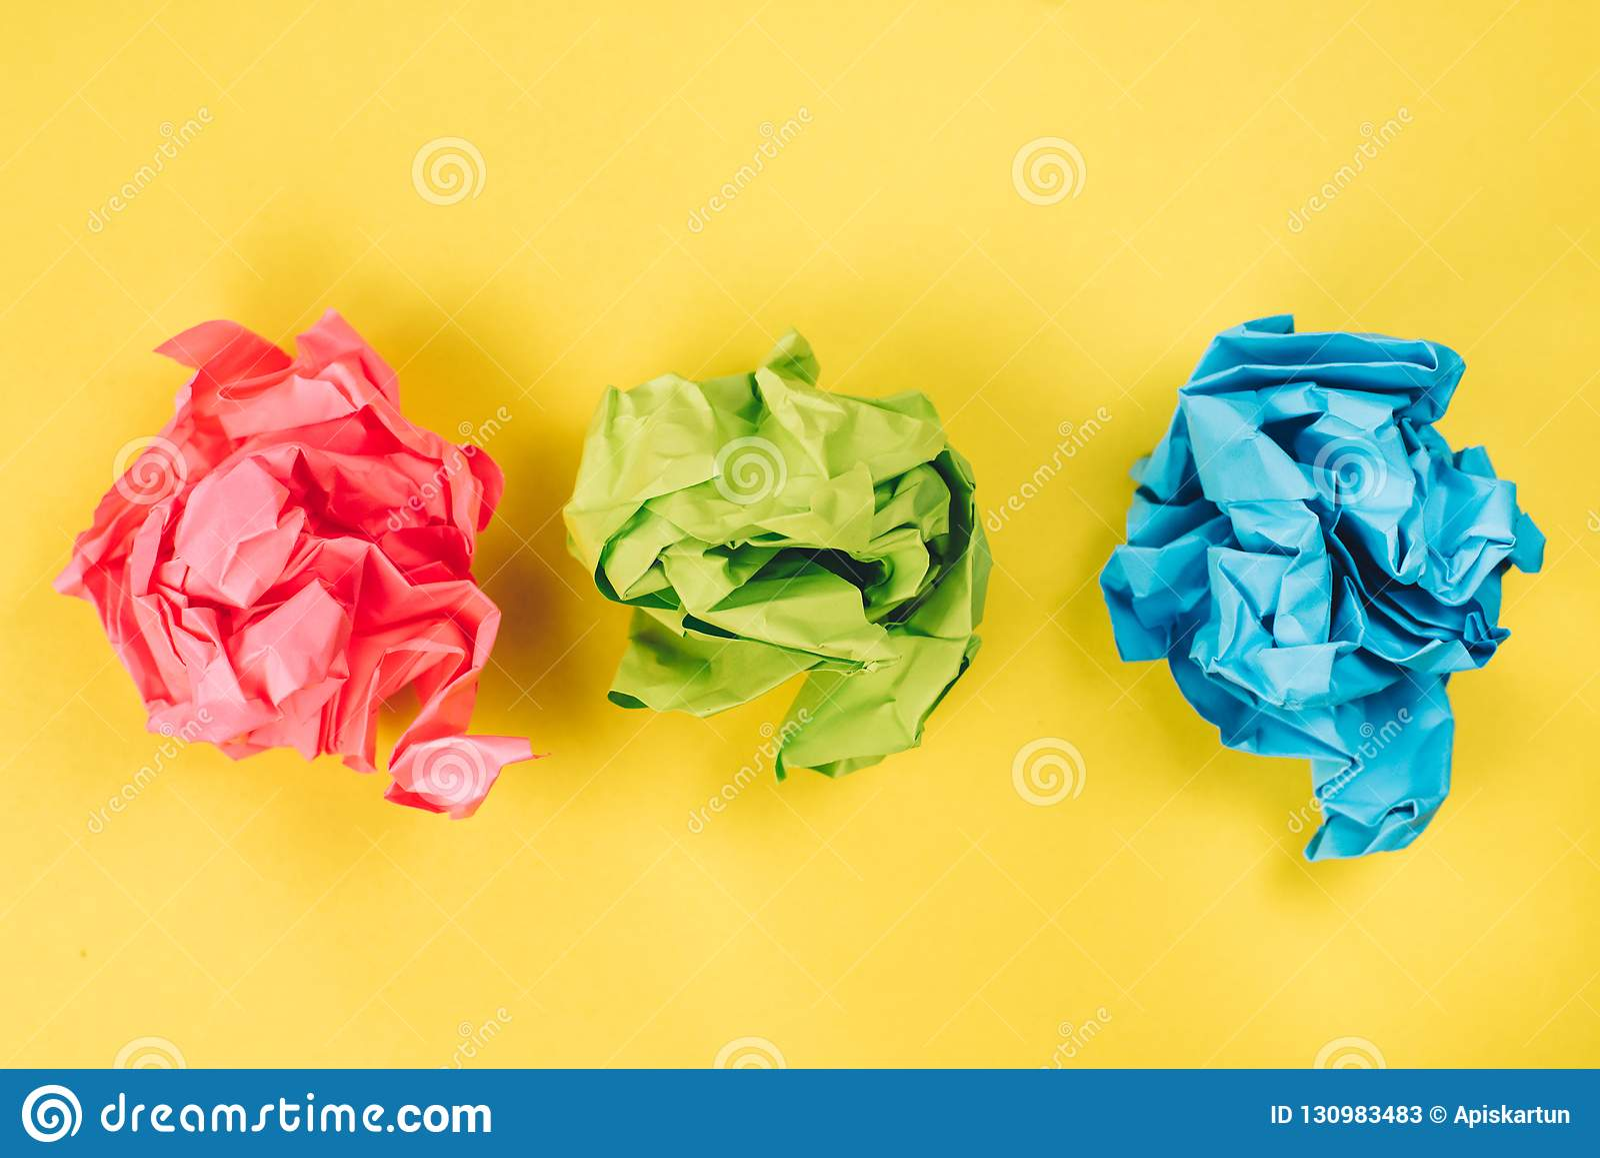 Roze, blauwe en groene verfrommelde document ballen op heldere gele achtergrond